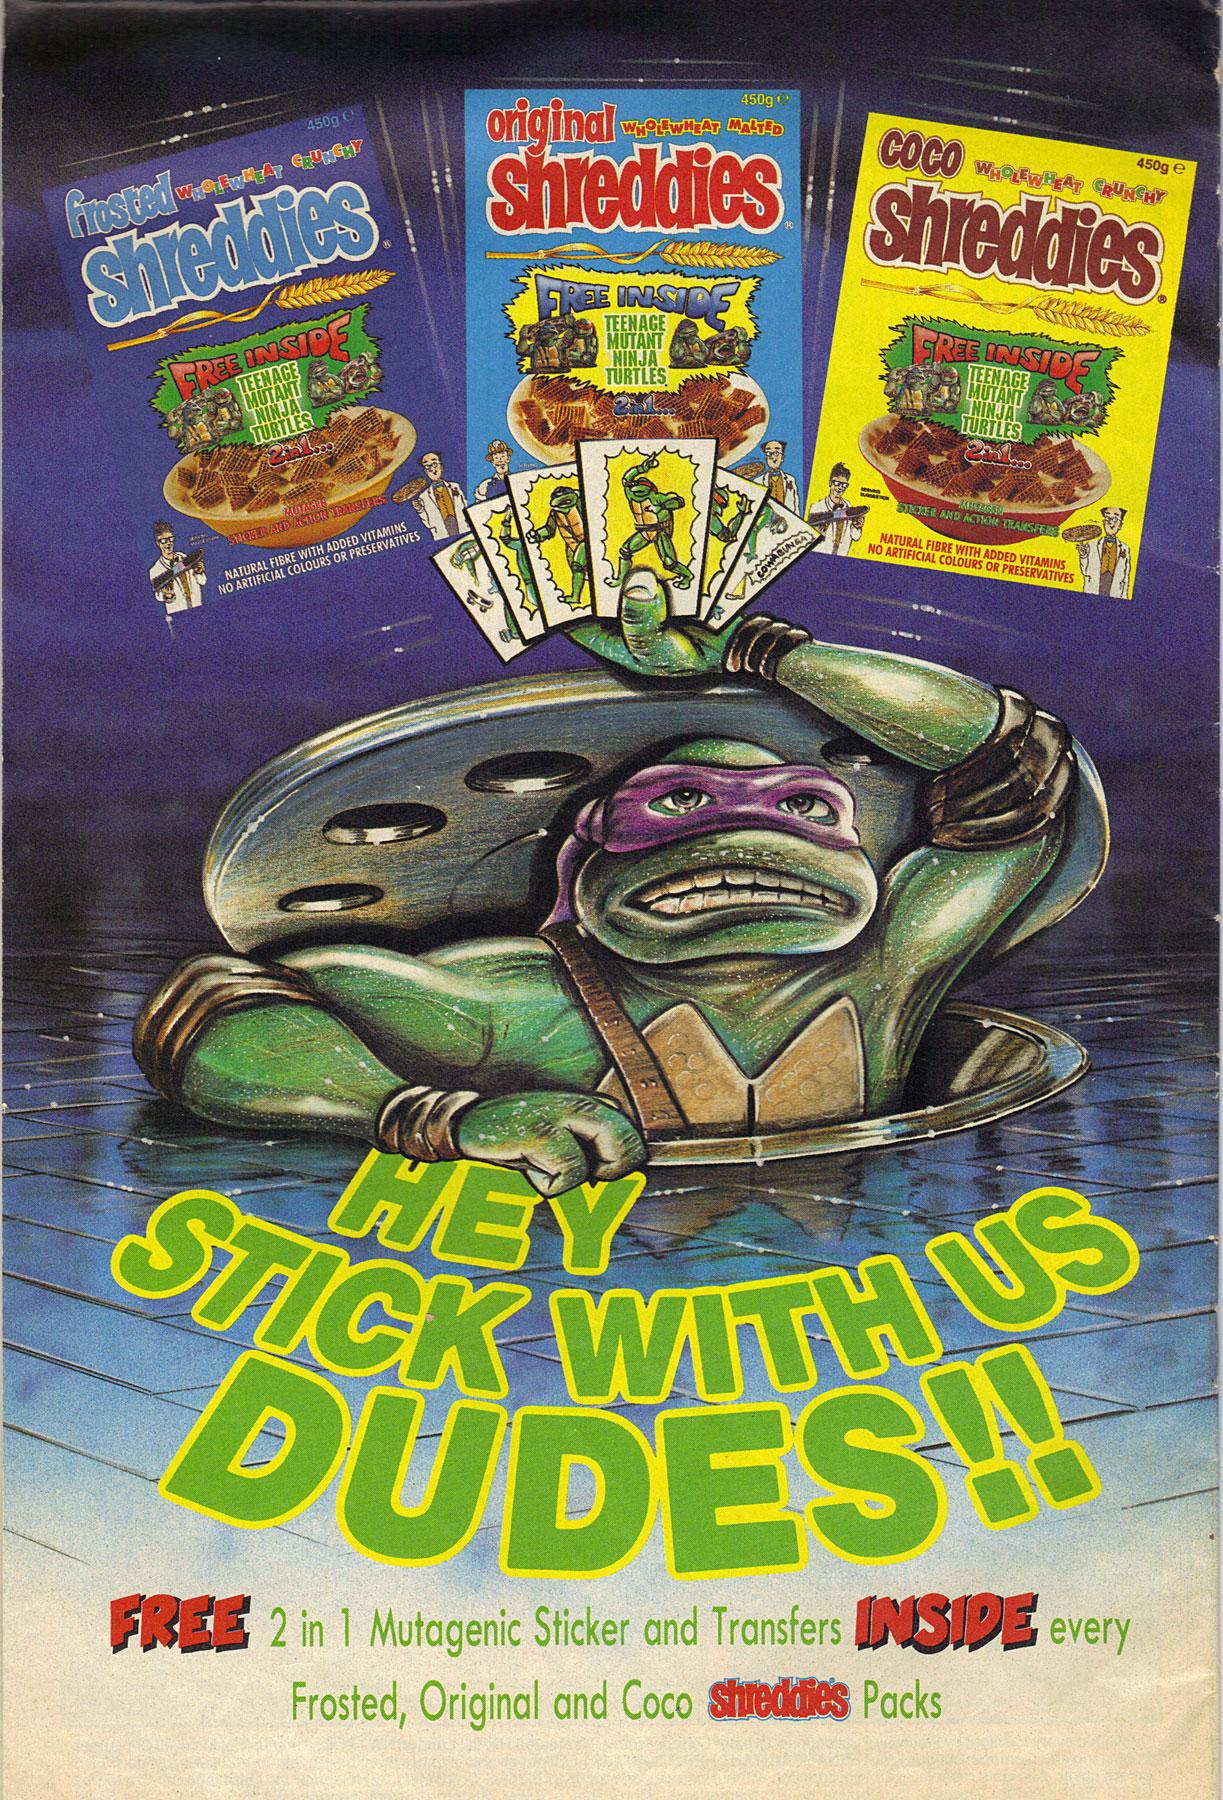 tmnt shreddies cereal infinite hollywood